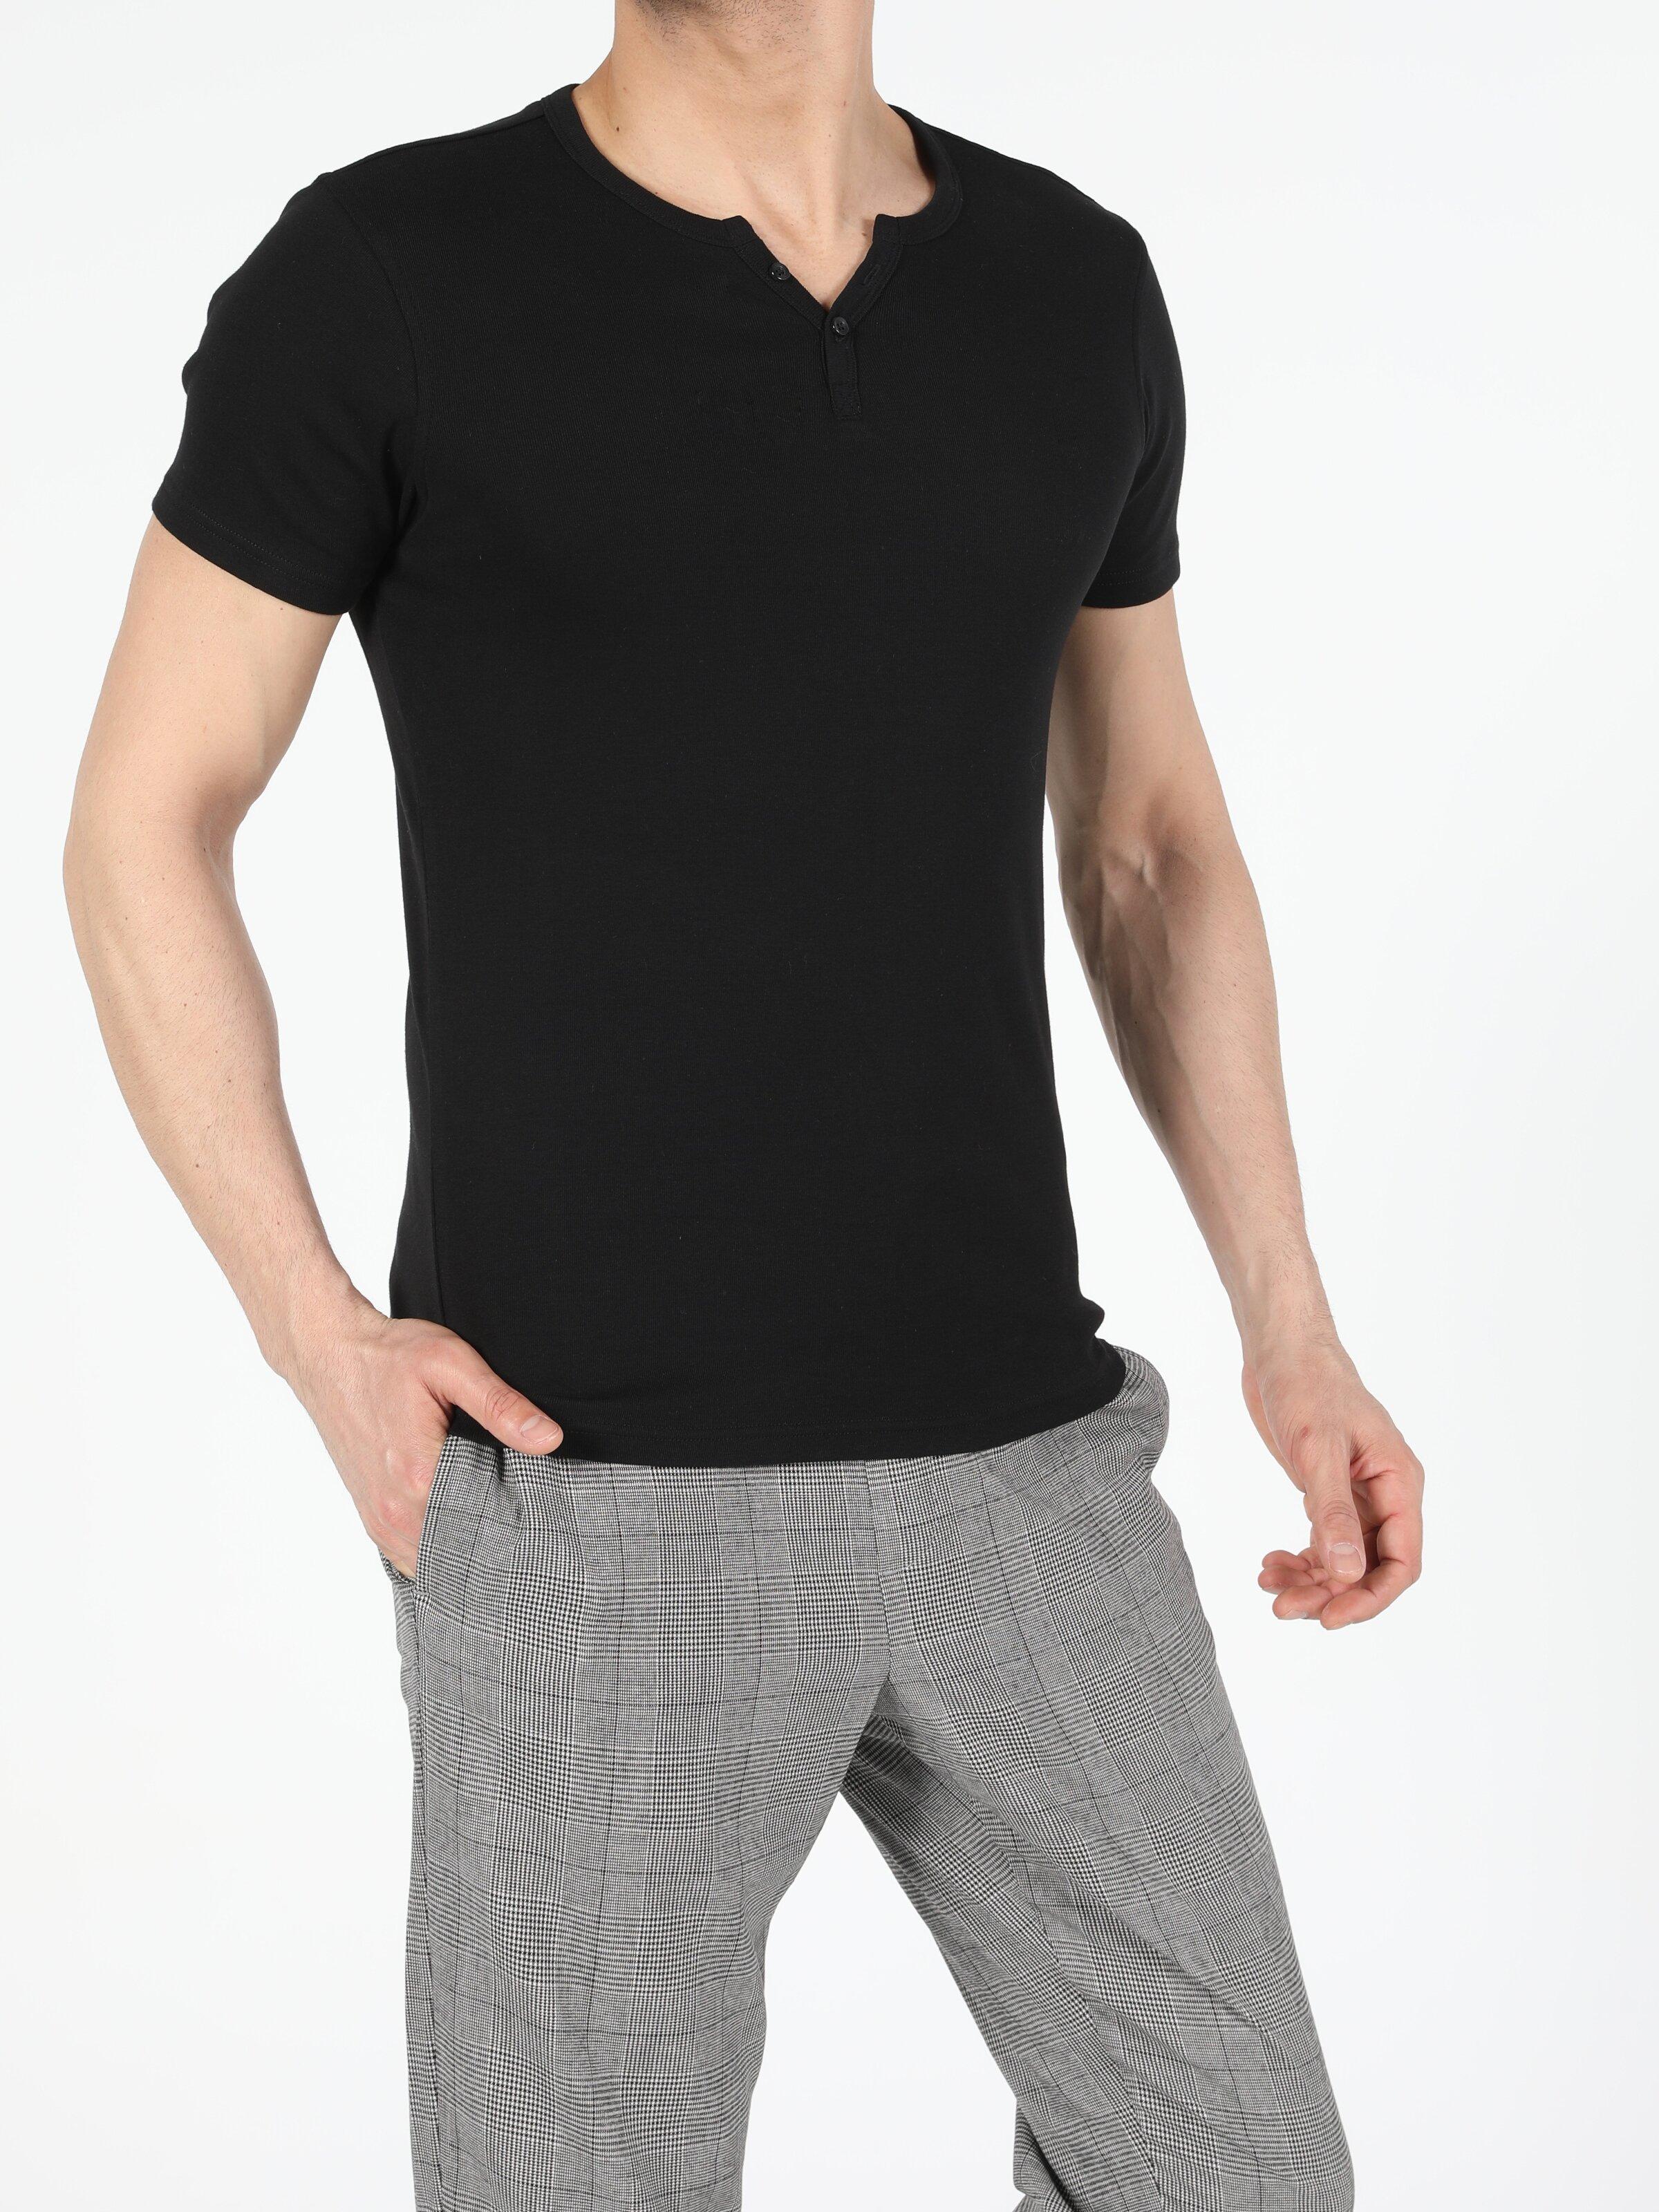 Slim Fit Placket Neck Erkek Siyah Kısa Kol Tişört